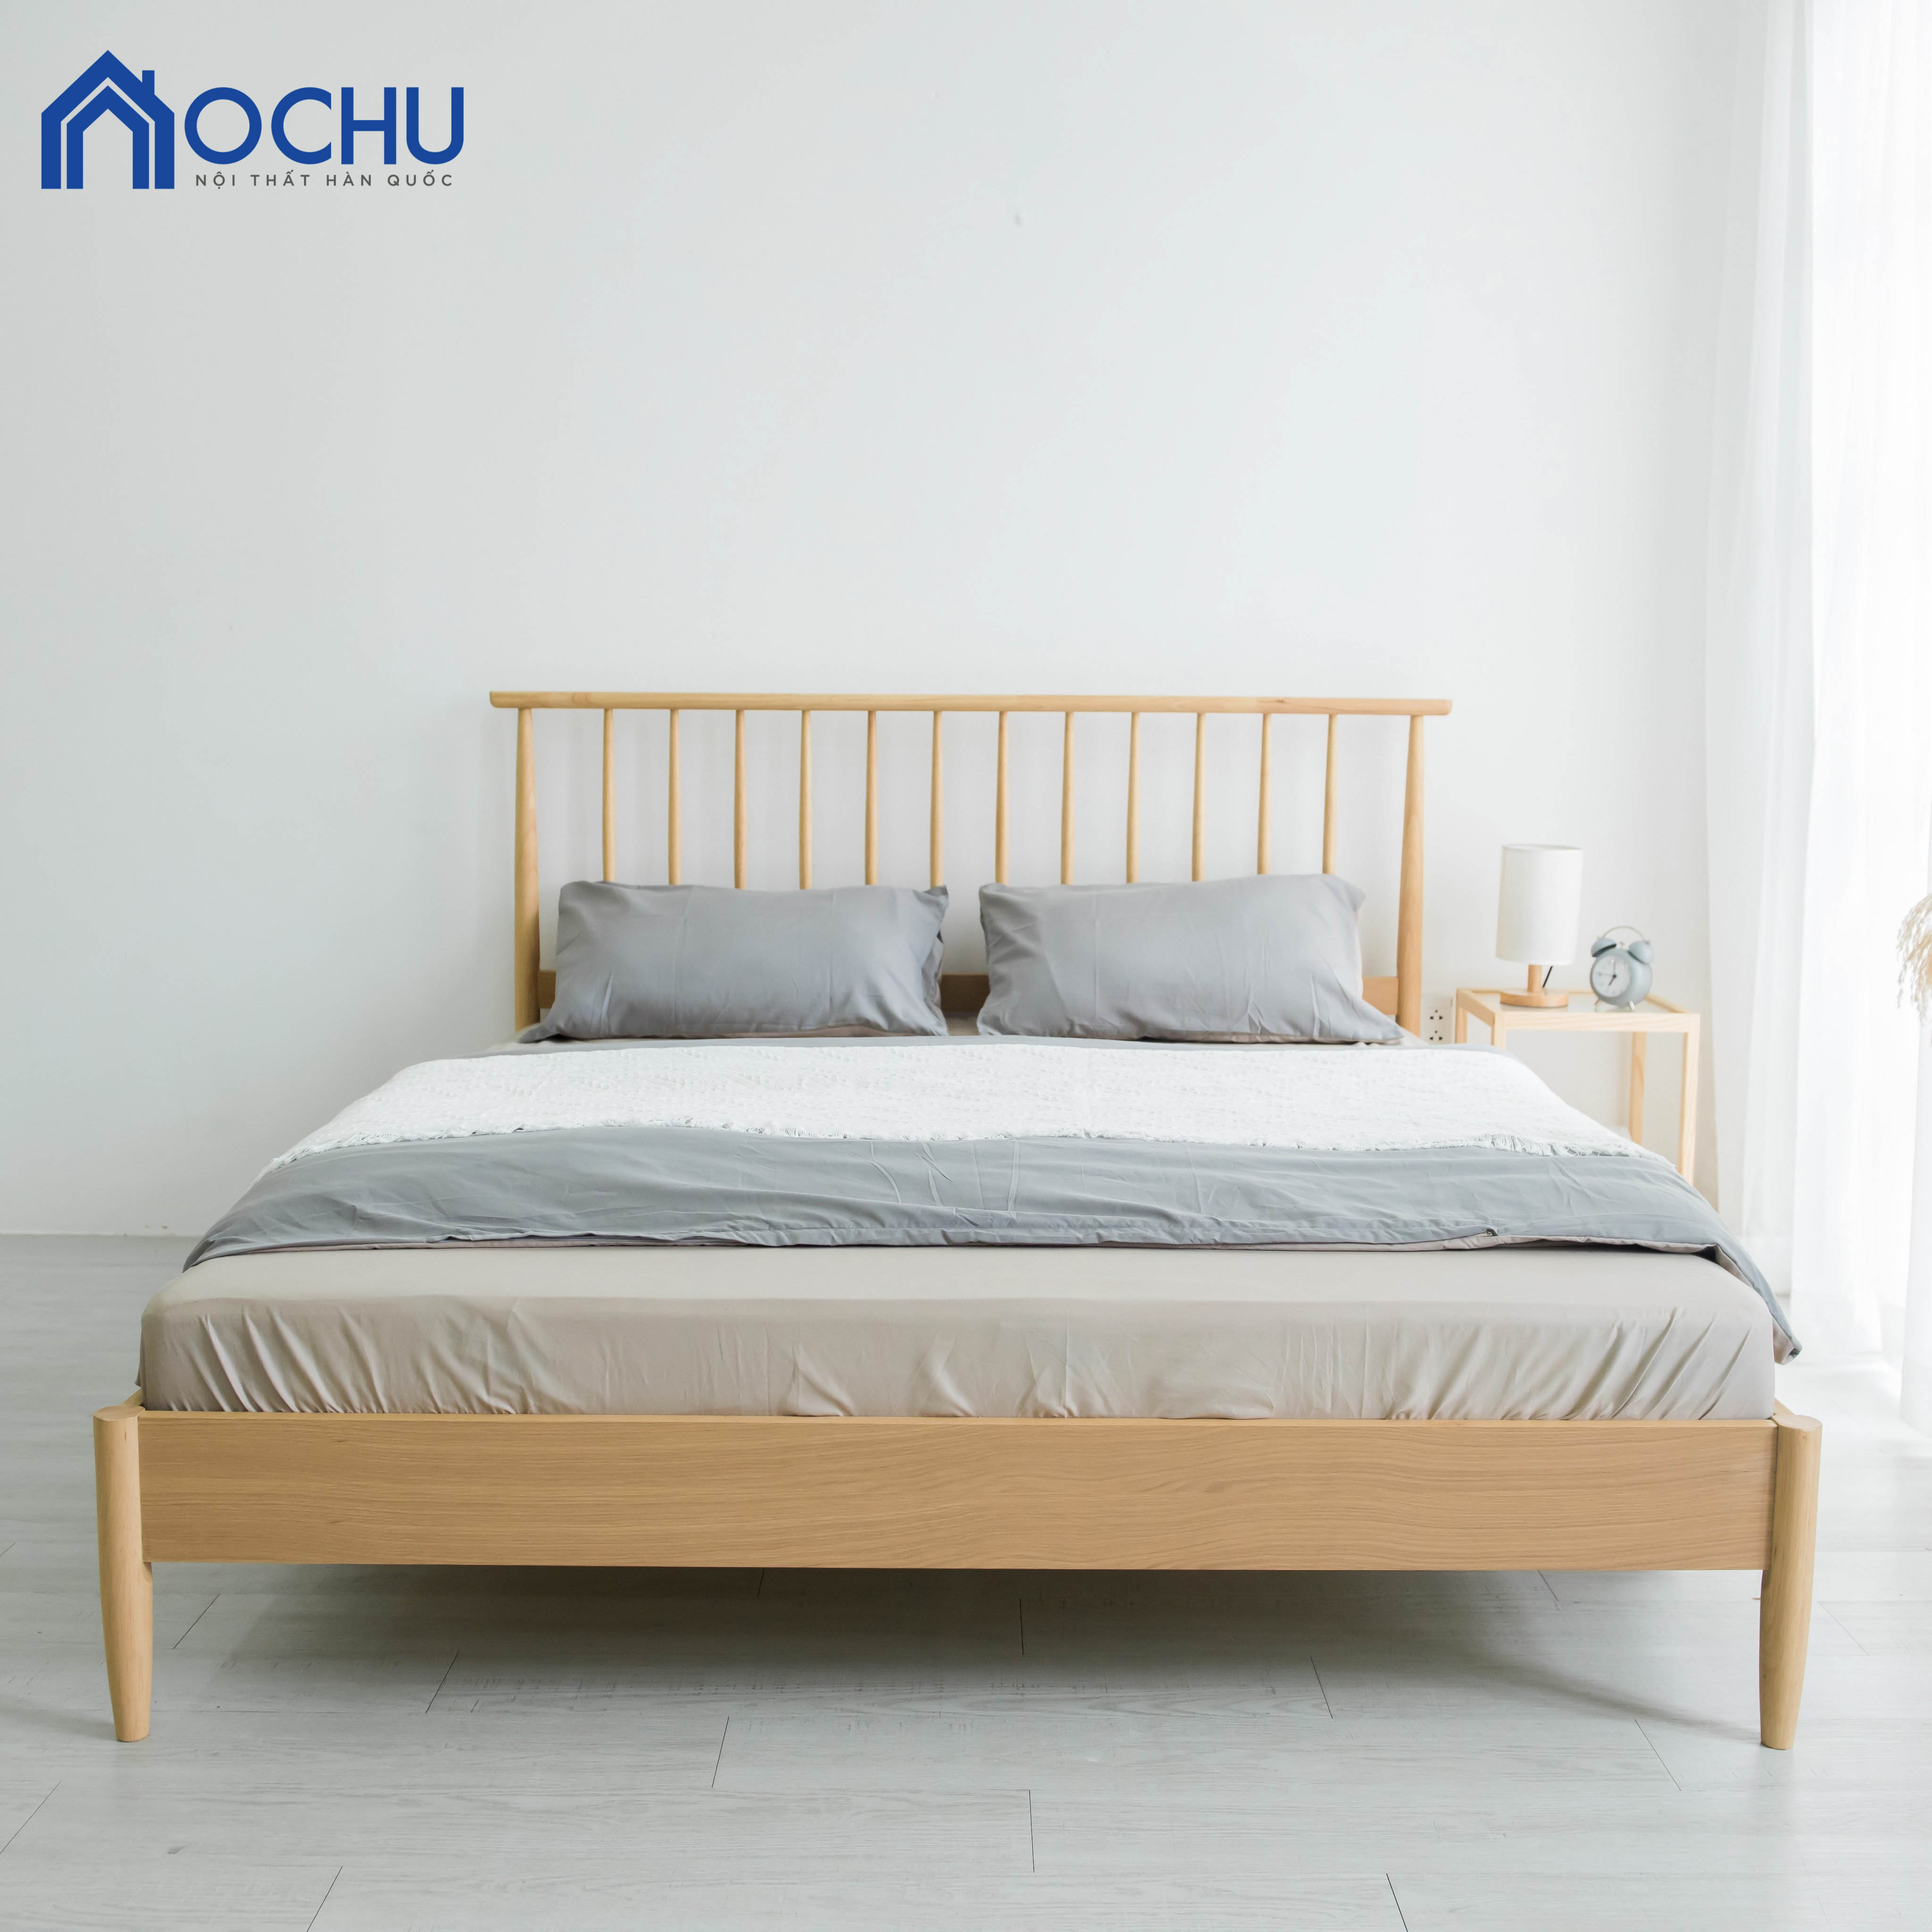 Giường Ngủ Gỗ Cao Su OCHU - Funky Bed - Natural